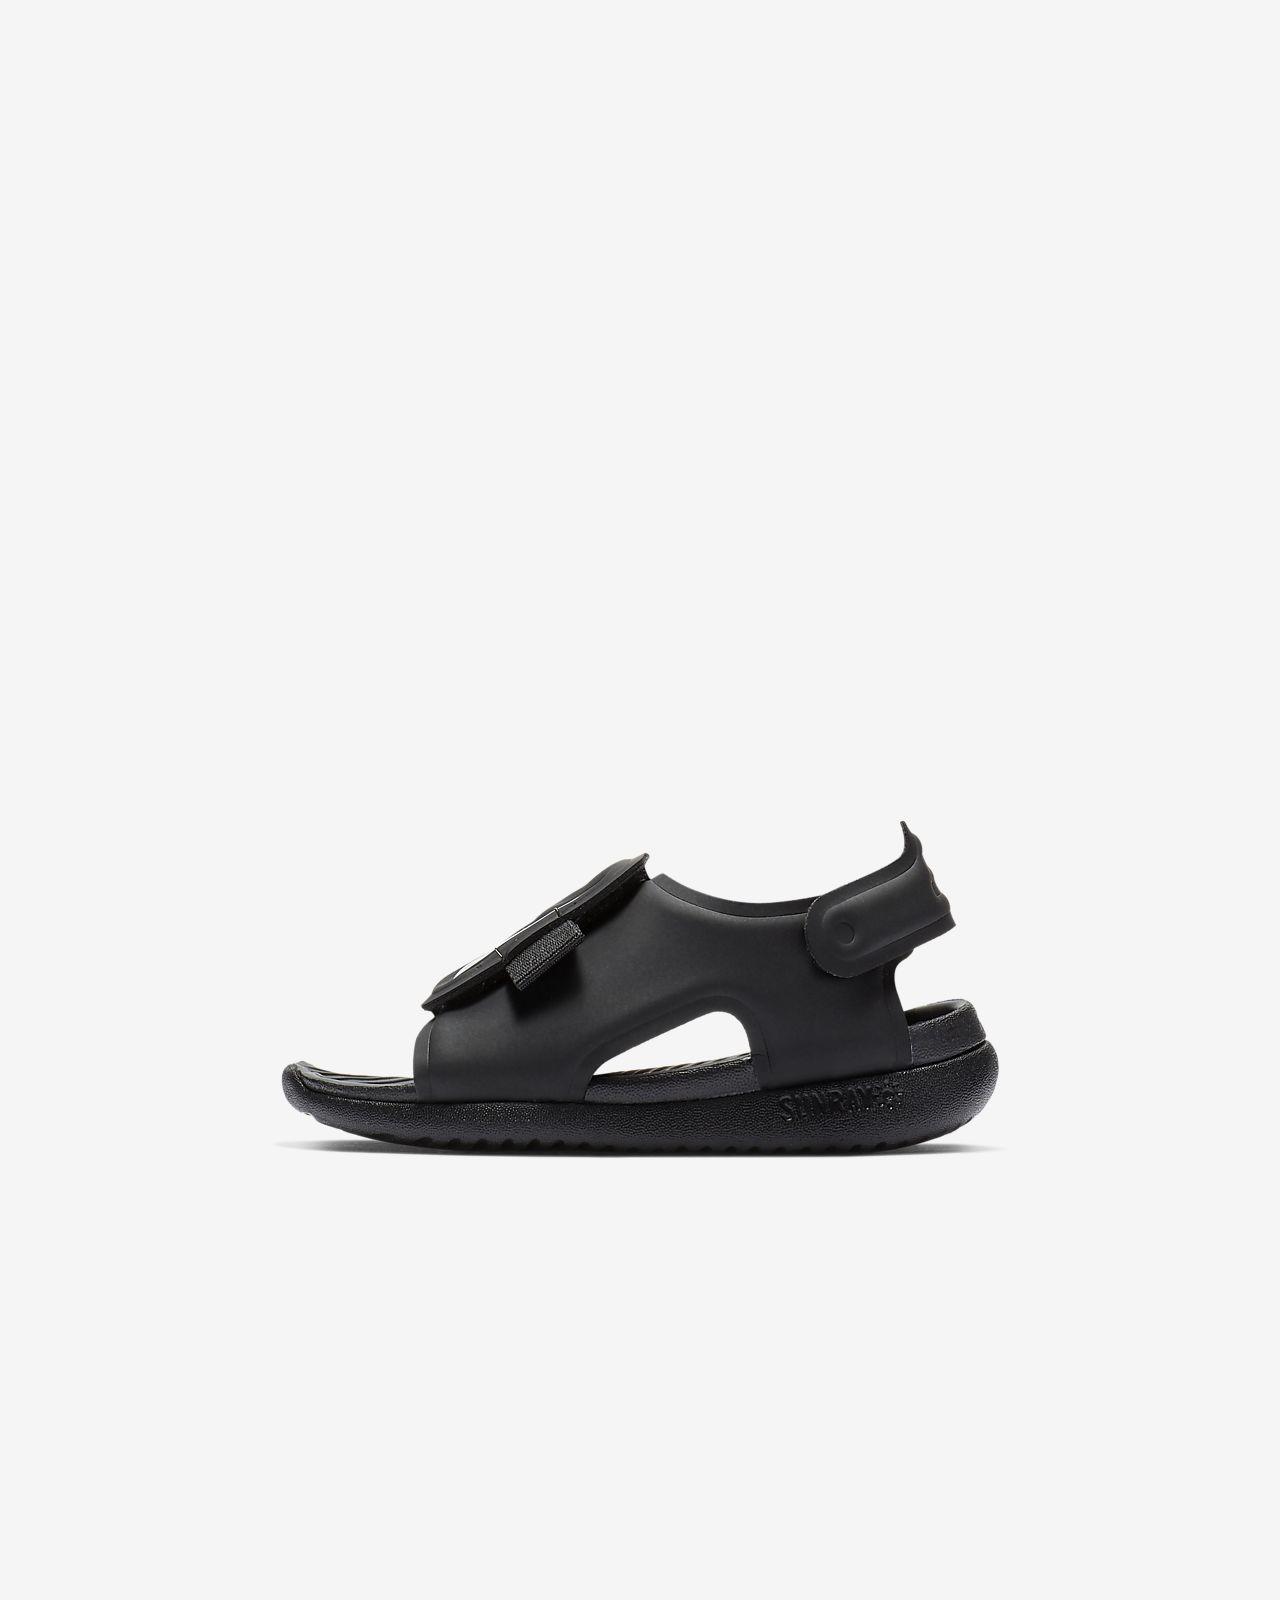 Nike Sunray Adjust 5 sandal til sped-/småbarn